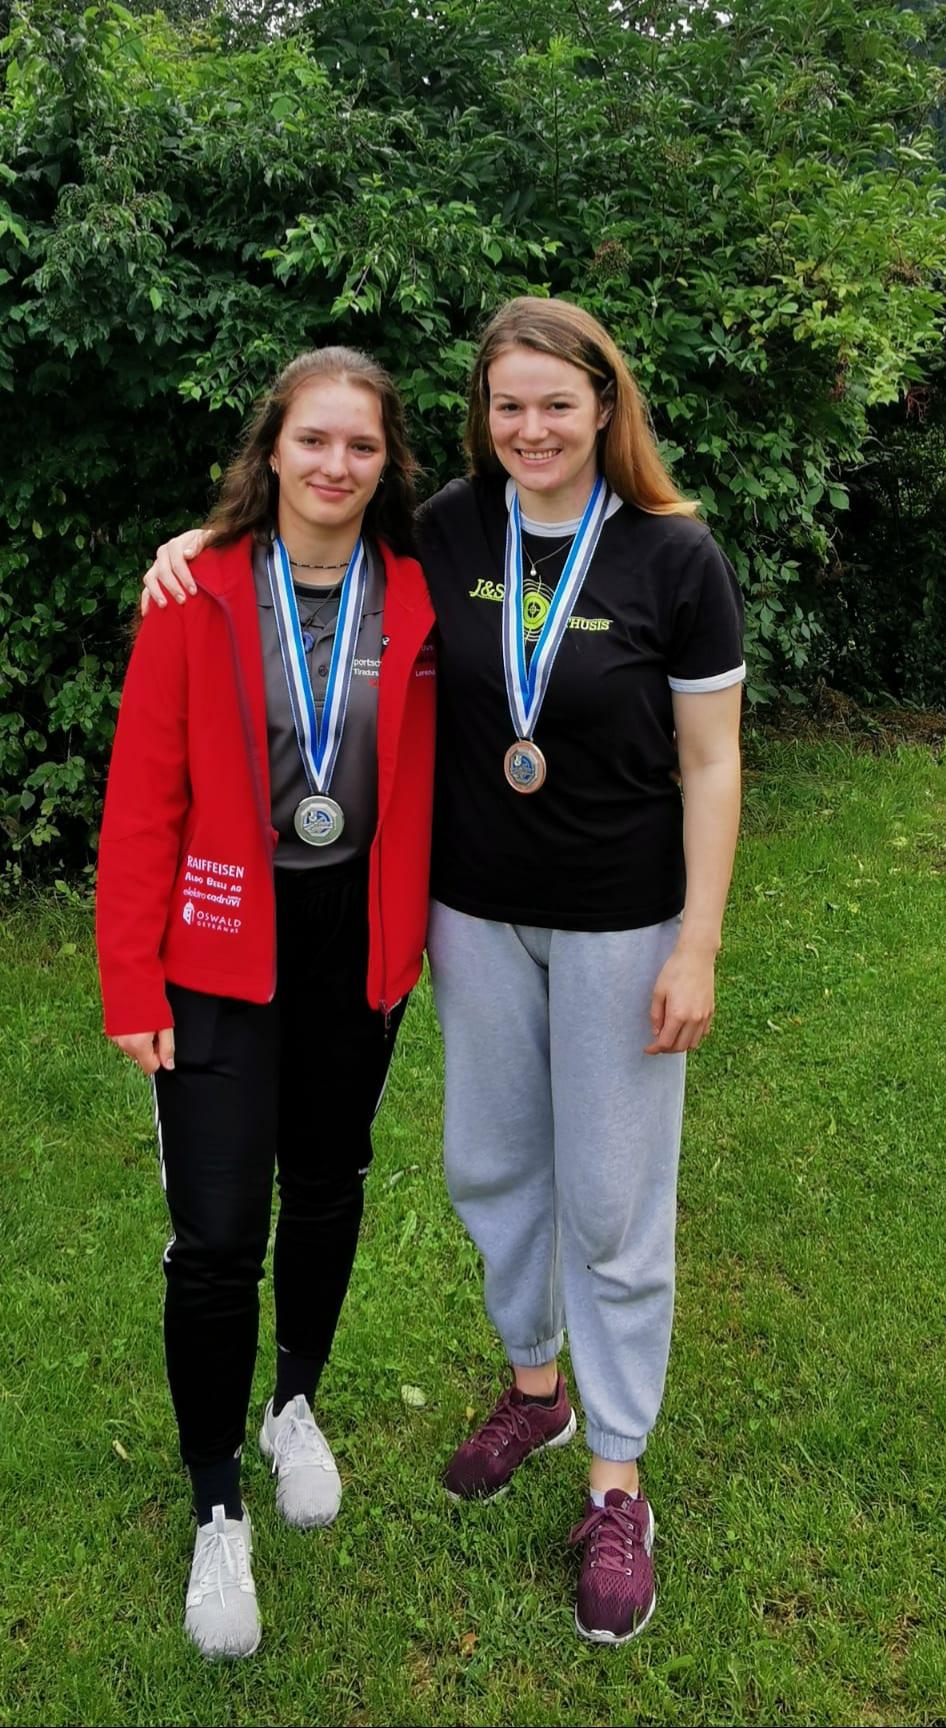 BMS 2021 liegend Jun 2. und 3. Rang Anja und Manuela